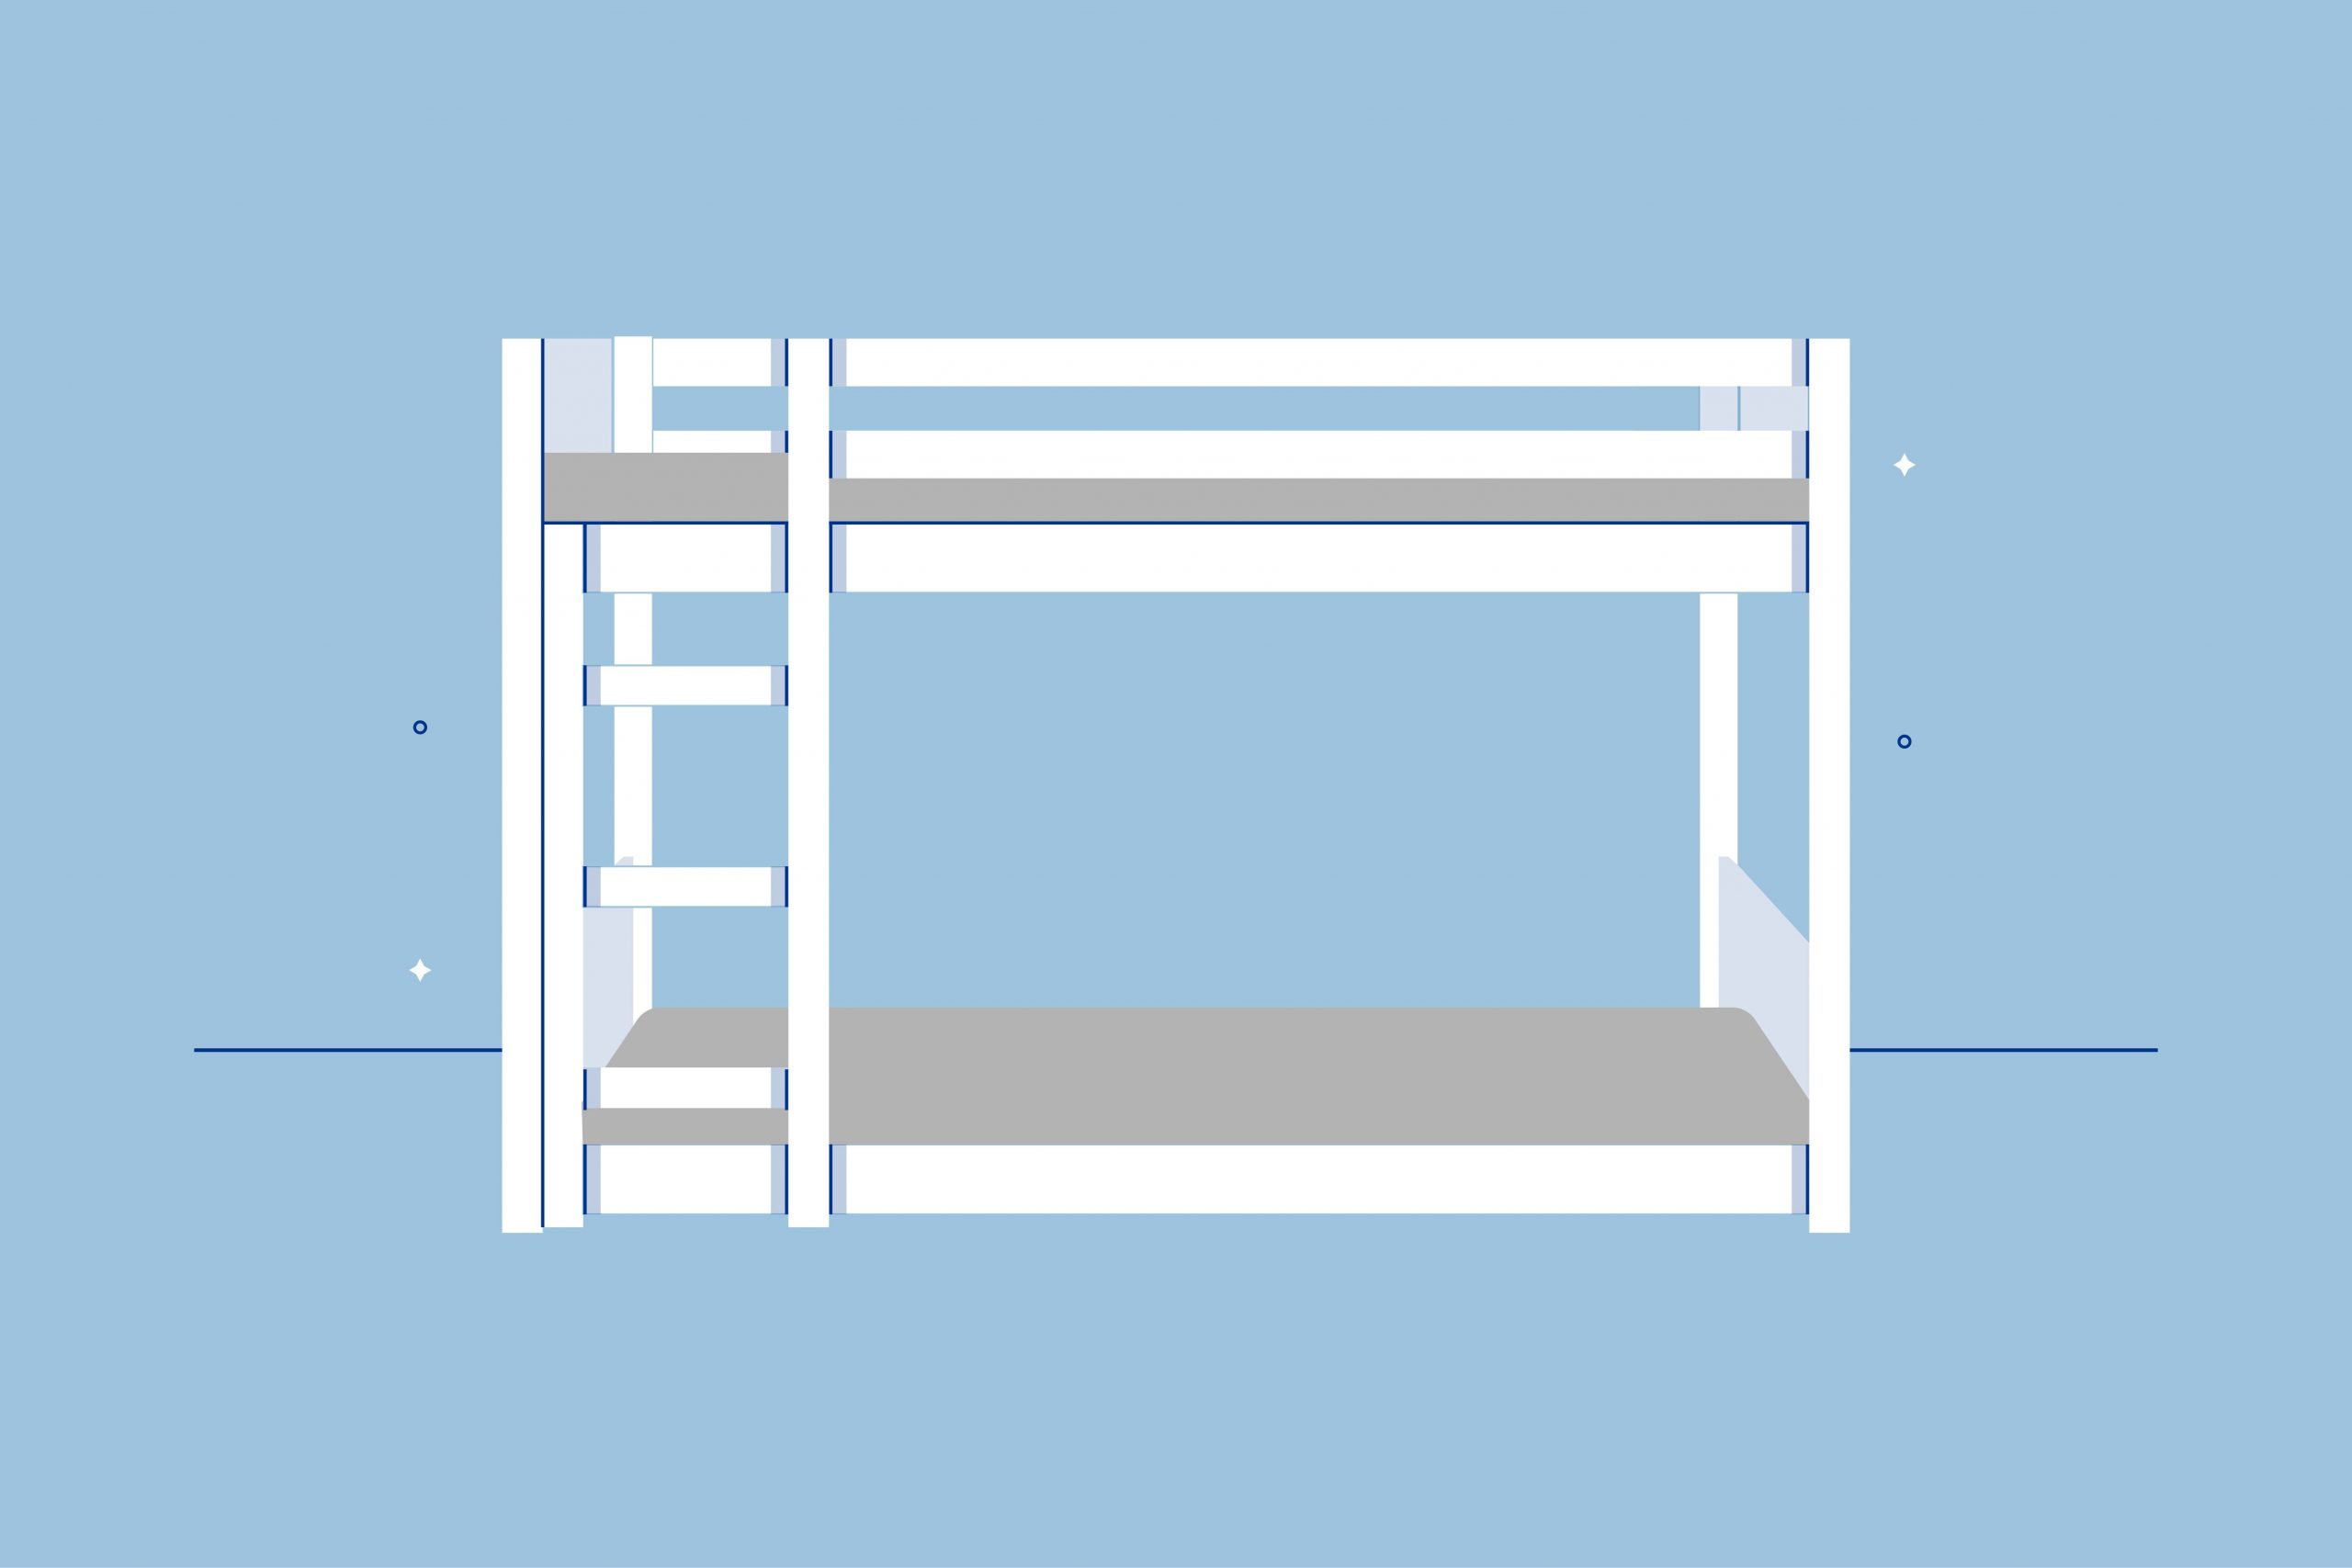 Bunk Bed Mattress Size Guide